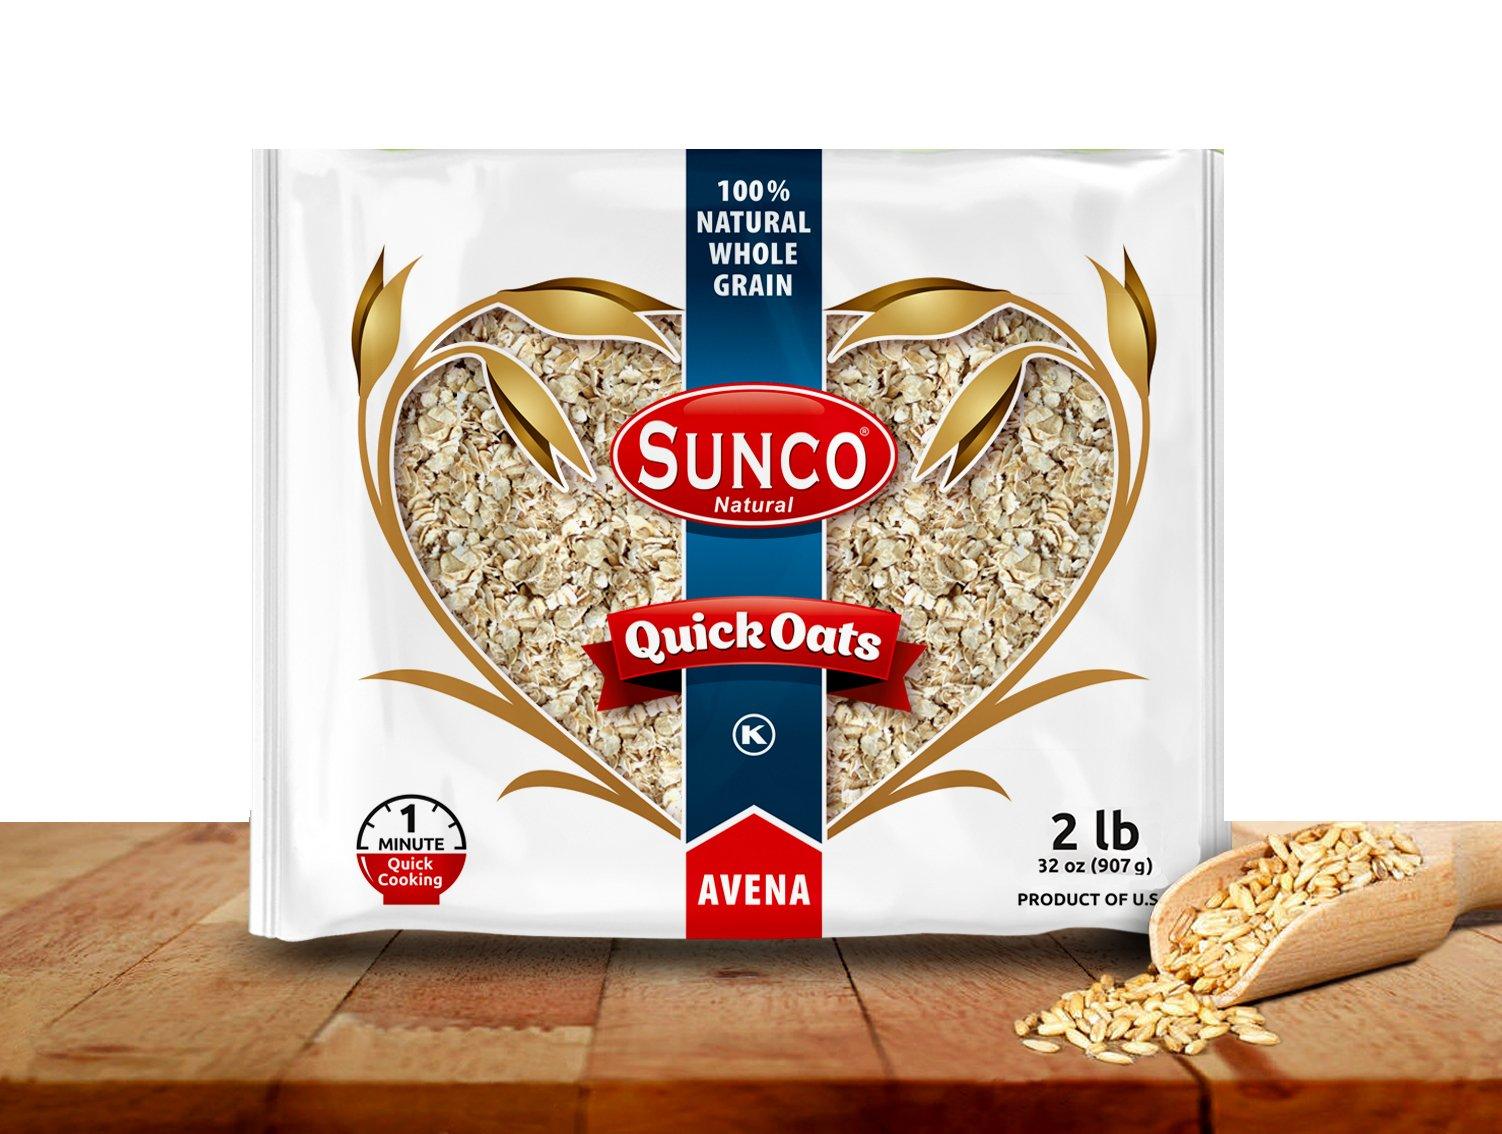 SUNCO Quick Oats 2 lbs (32 oz), Pack of 2